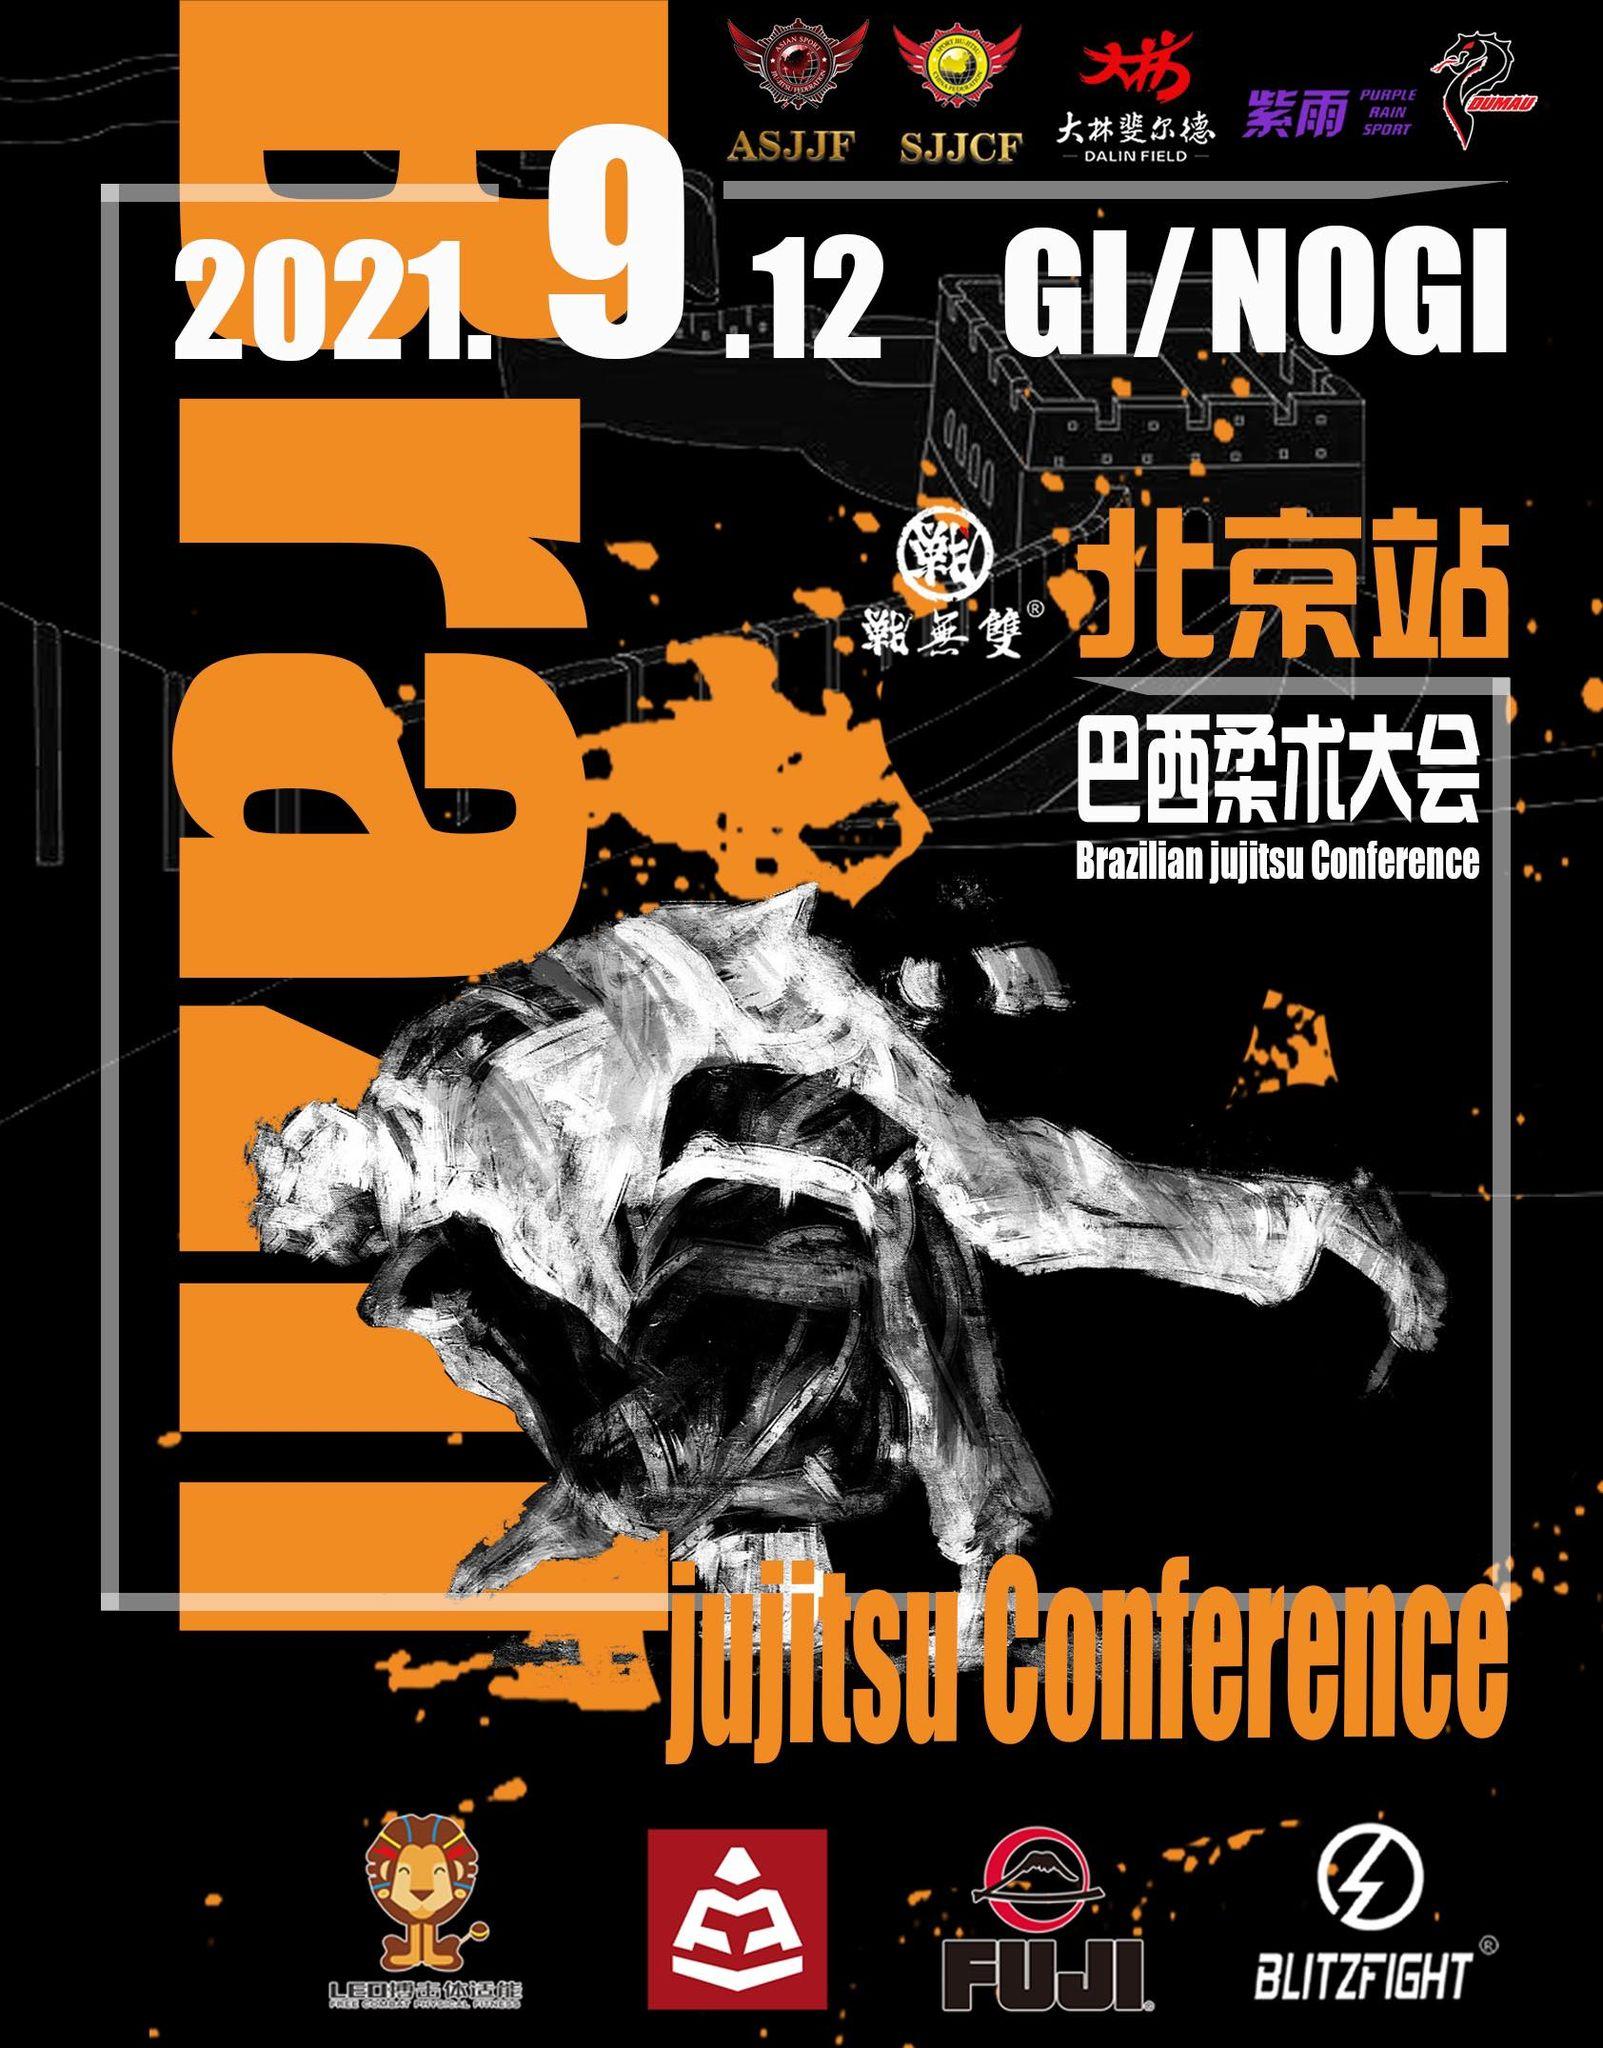 sjjcf Beijing no-gi championship 2021